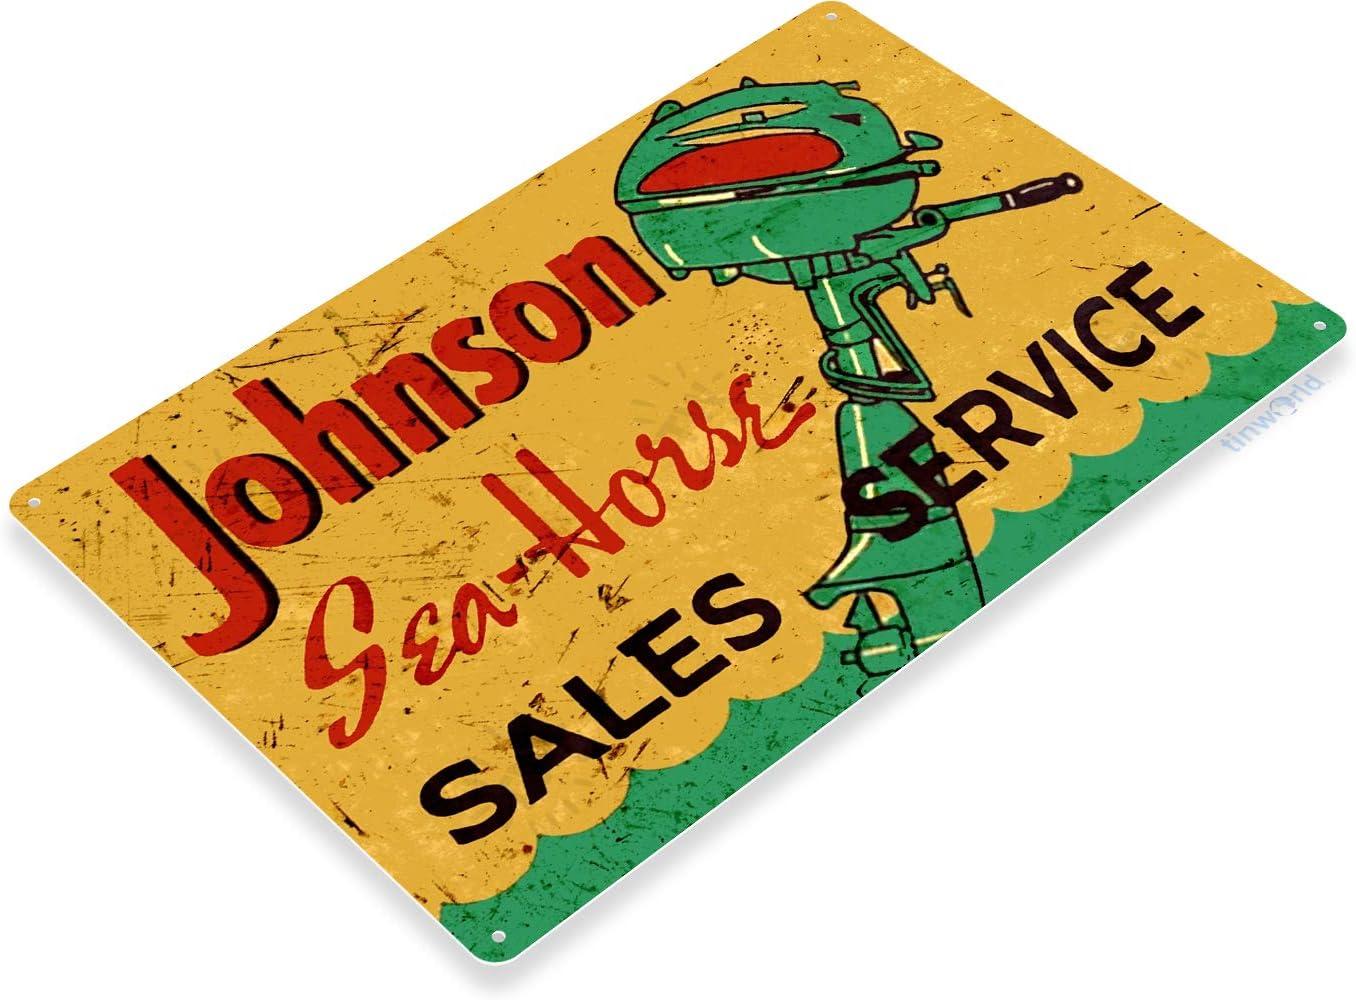 Johnson Sea-Horse Outboard Motors RY Lake Beach House Garage Marina Boat Sign